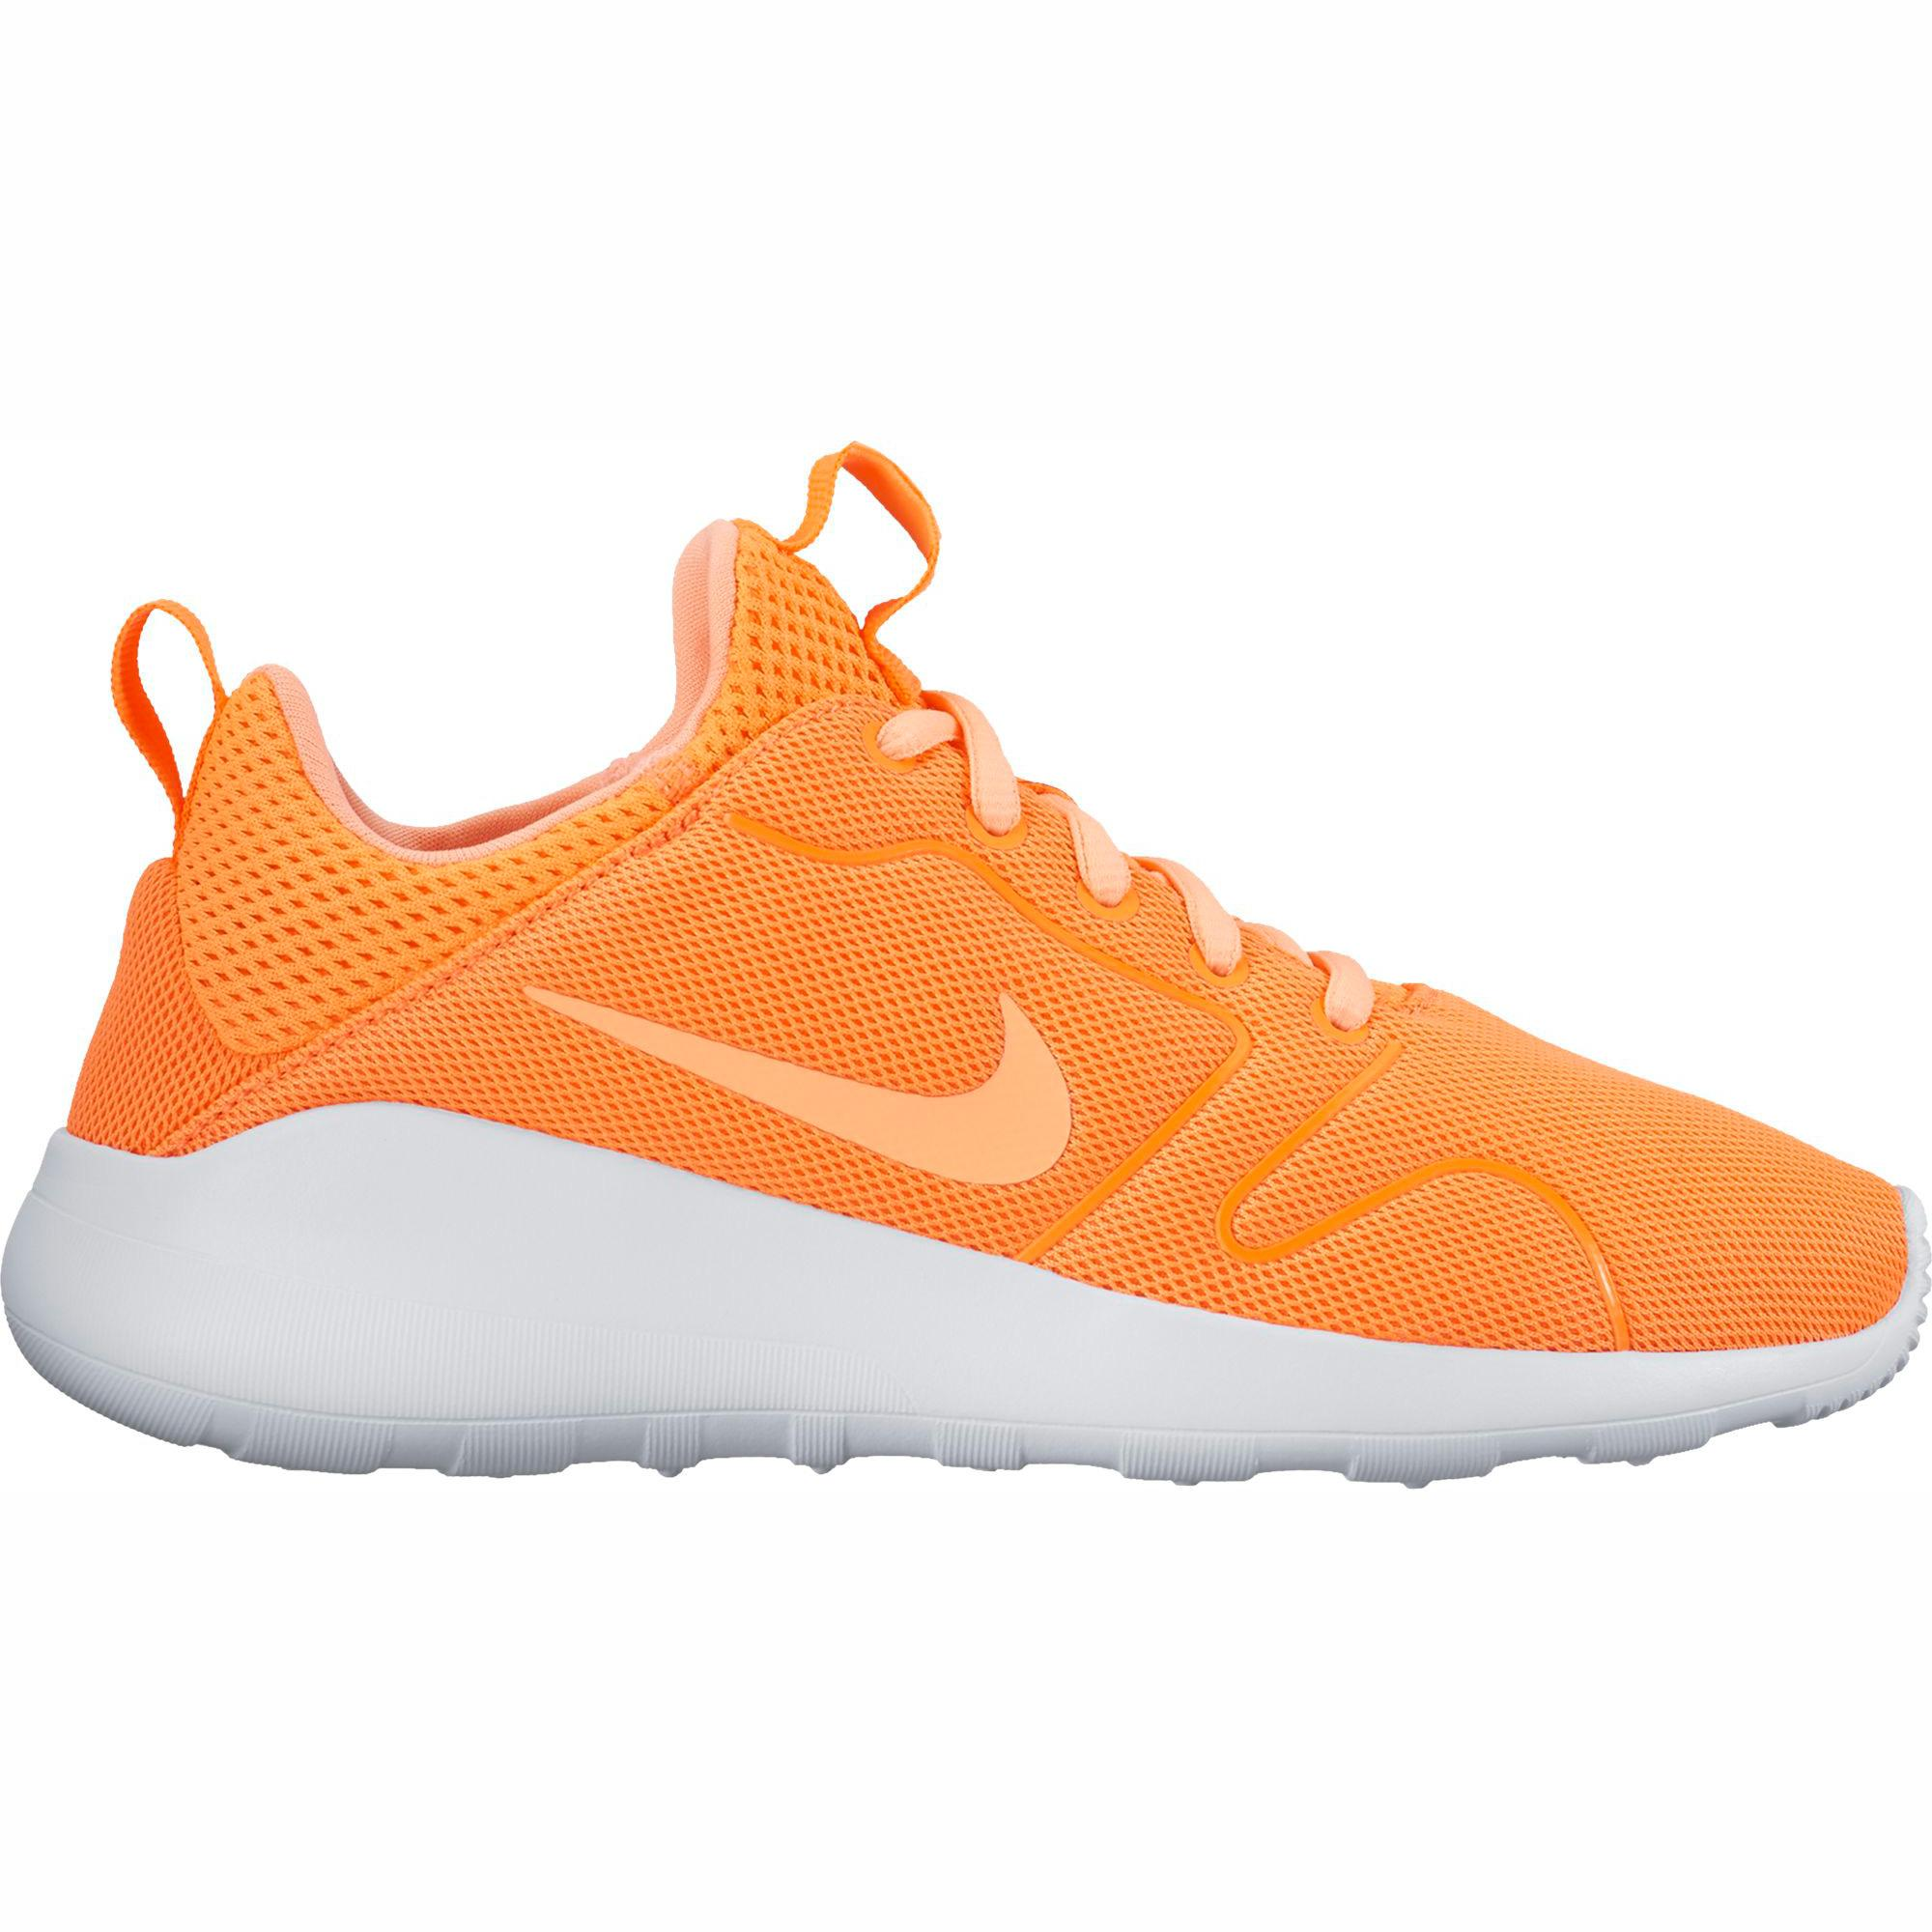 buy online bebe4 53983 ... low cost nike womens kaishi 2.0 running shoes tart sunset glow 6a851  d3190